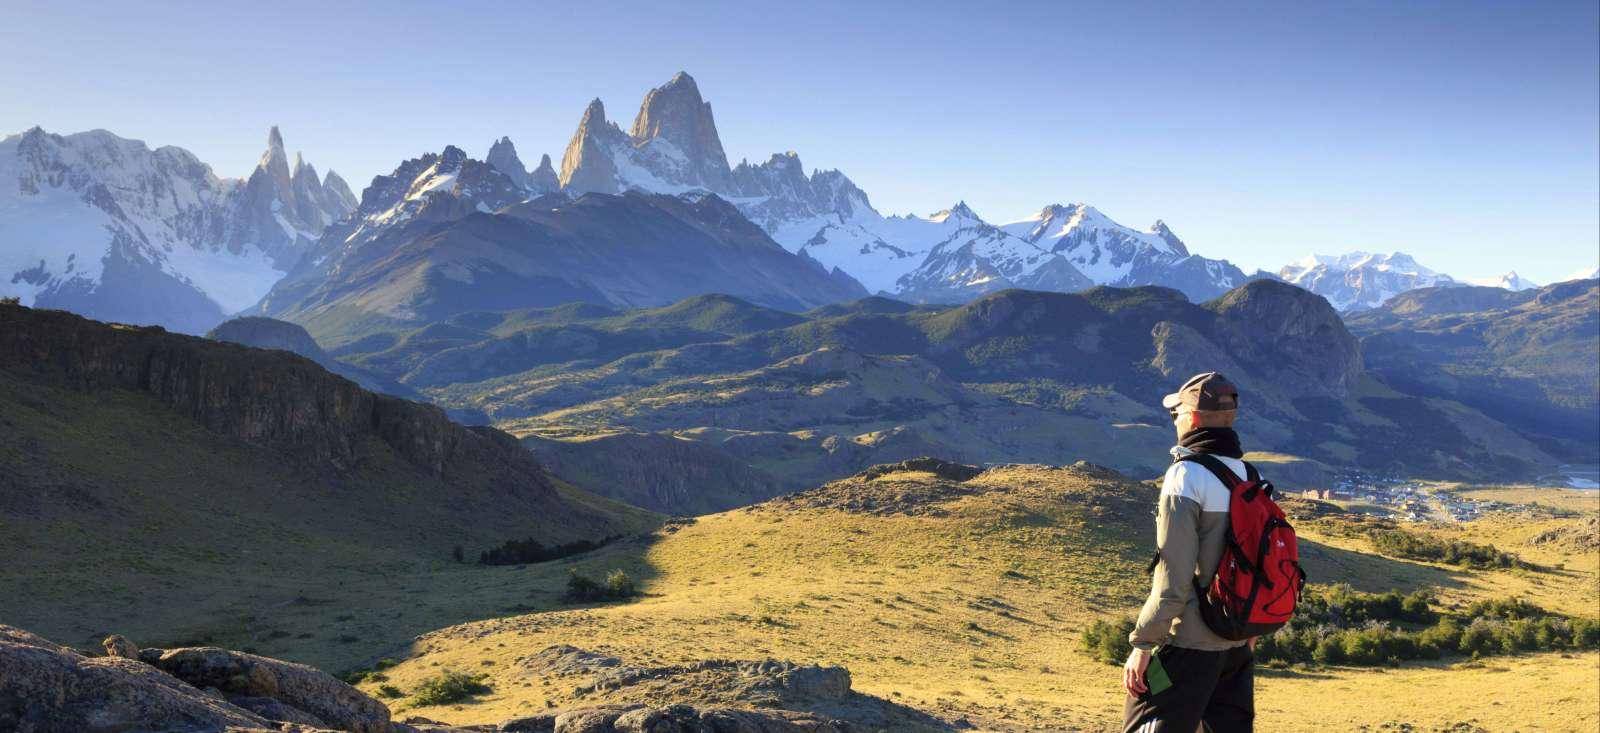 Voyage à pied Argentine : Brut de Patagonie